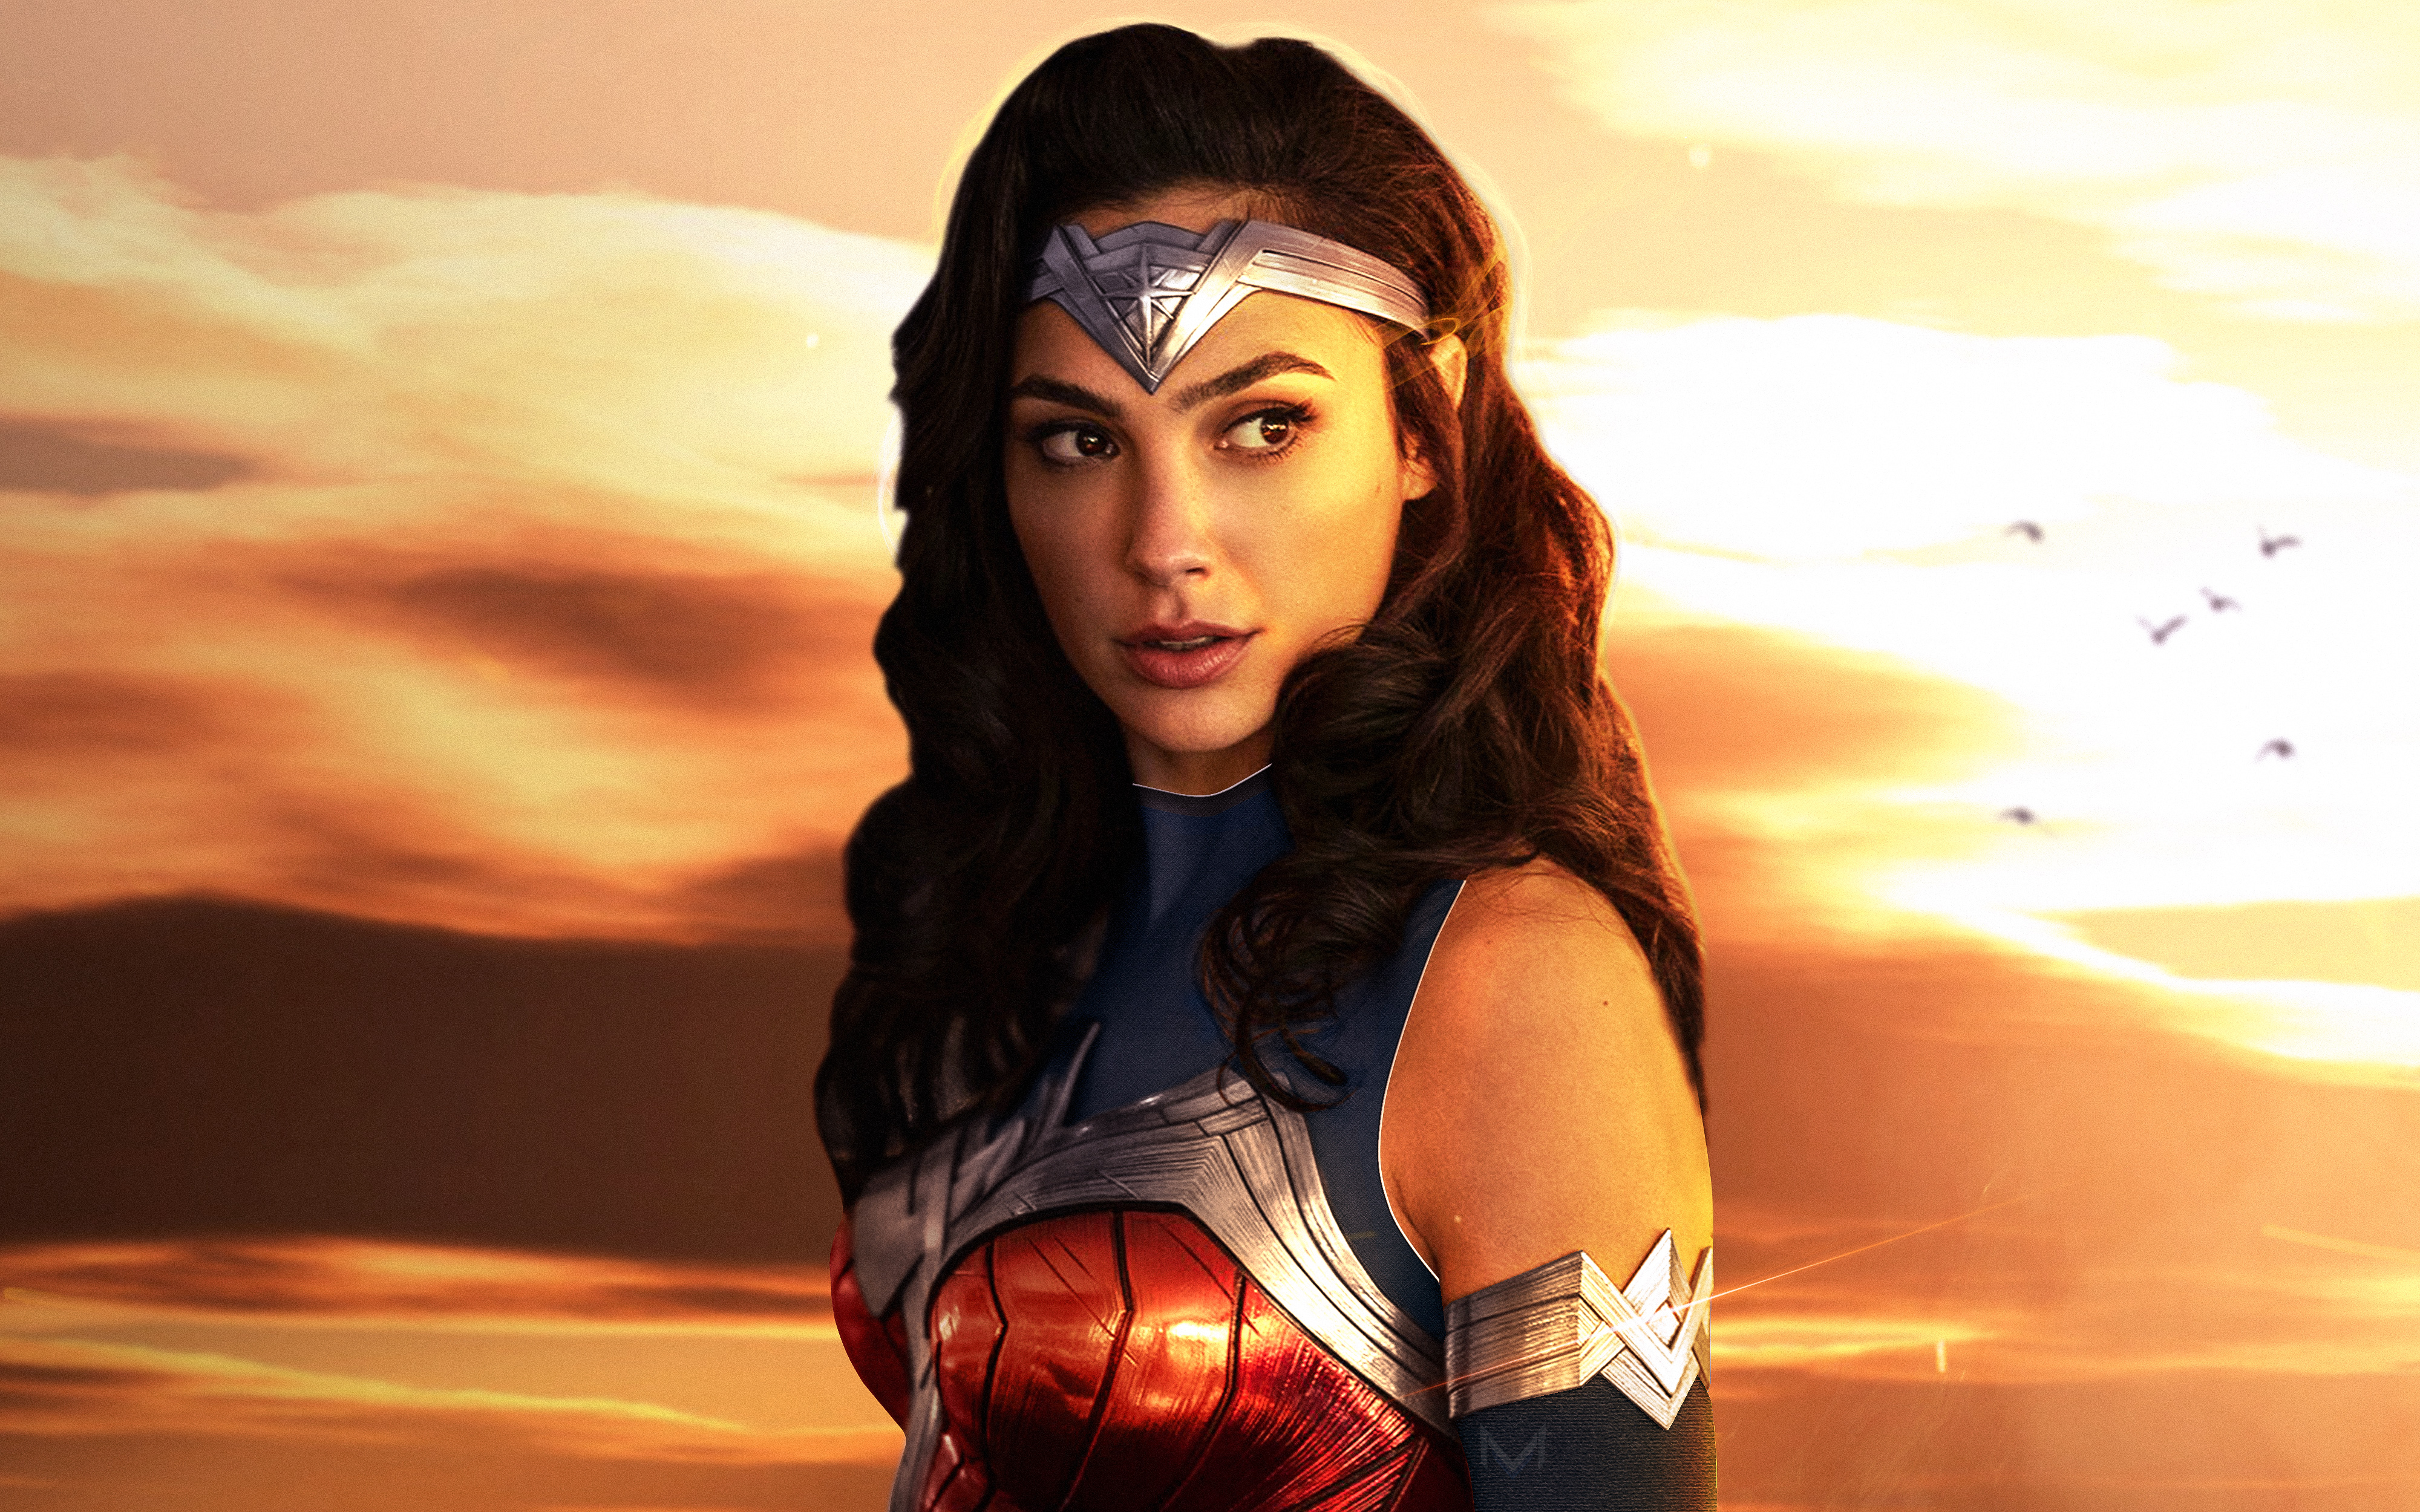 Gal Gadot As Wonder Woman Wallpapers Hd Wallpapers